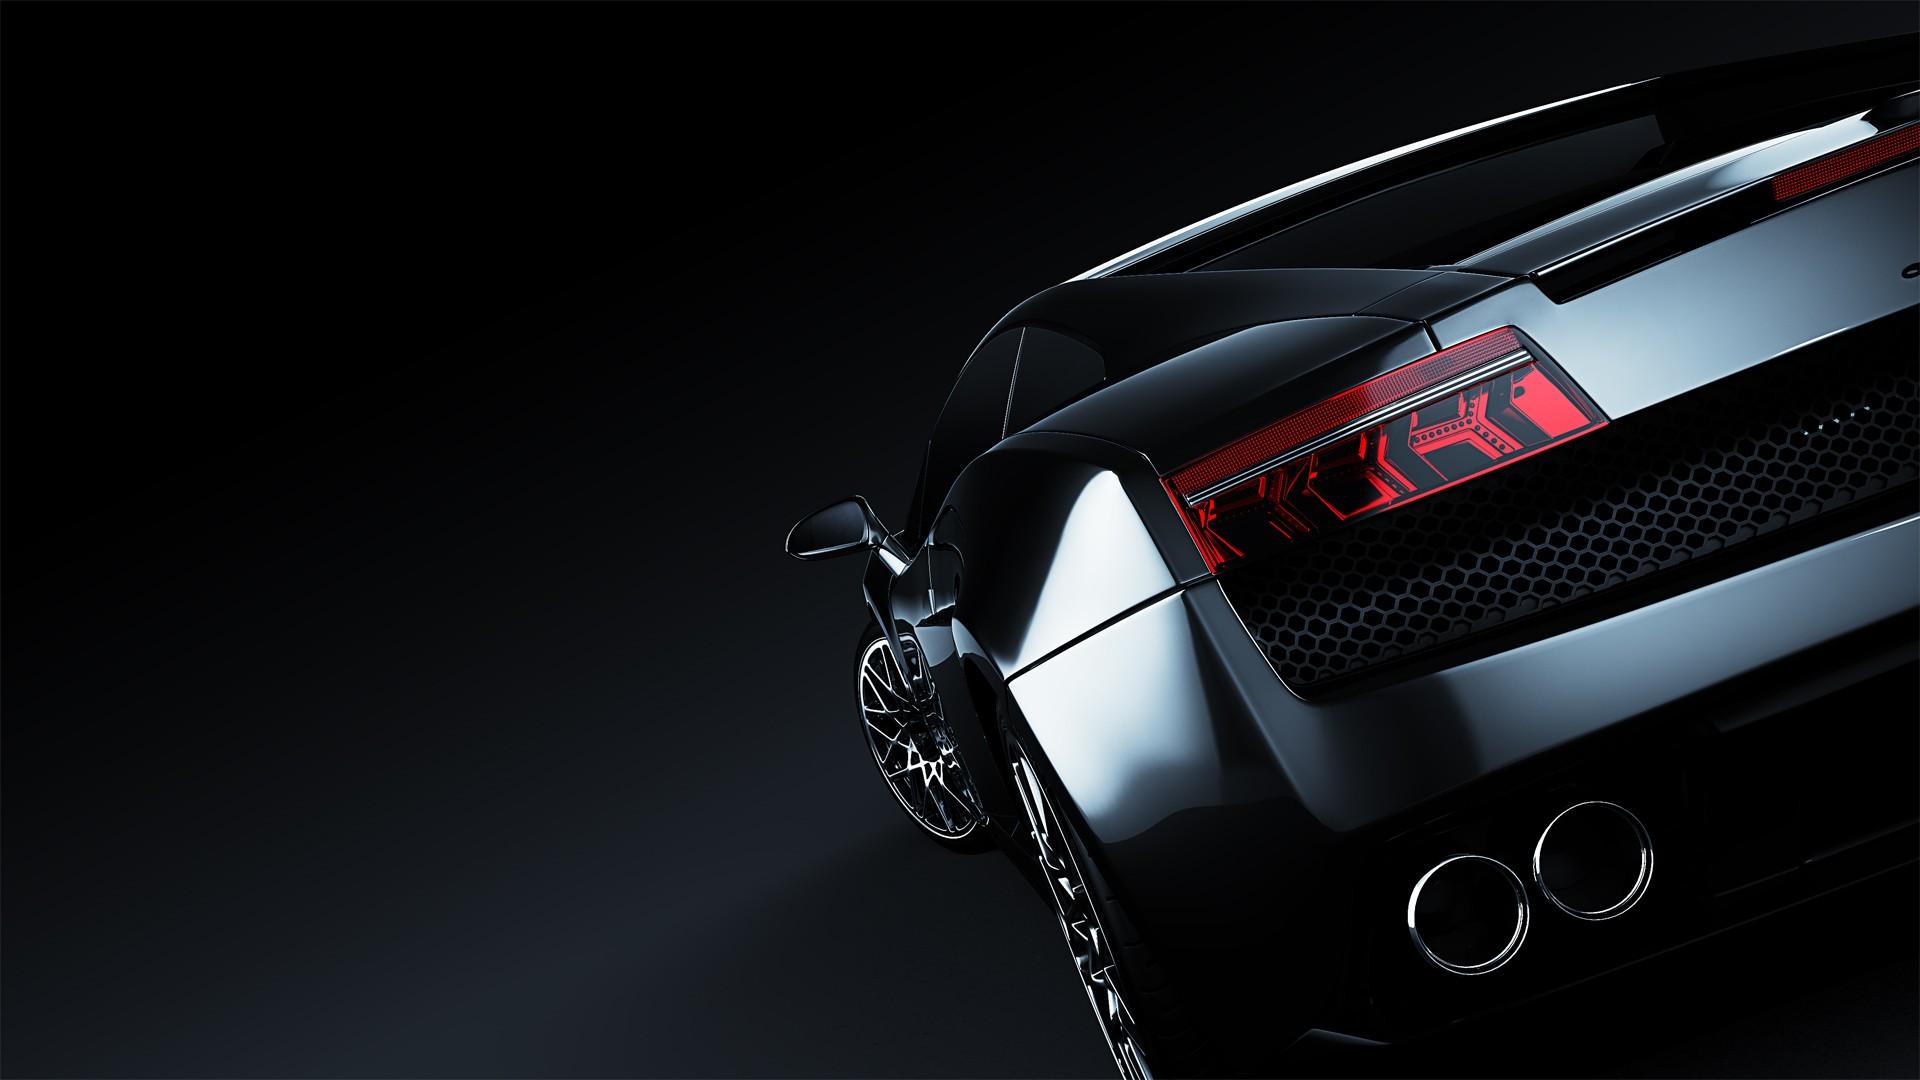 Lamborghini HD Wallpaper 1080P Hd Wallpaper 1920x1080